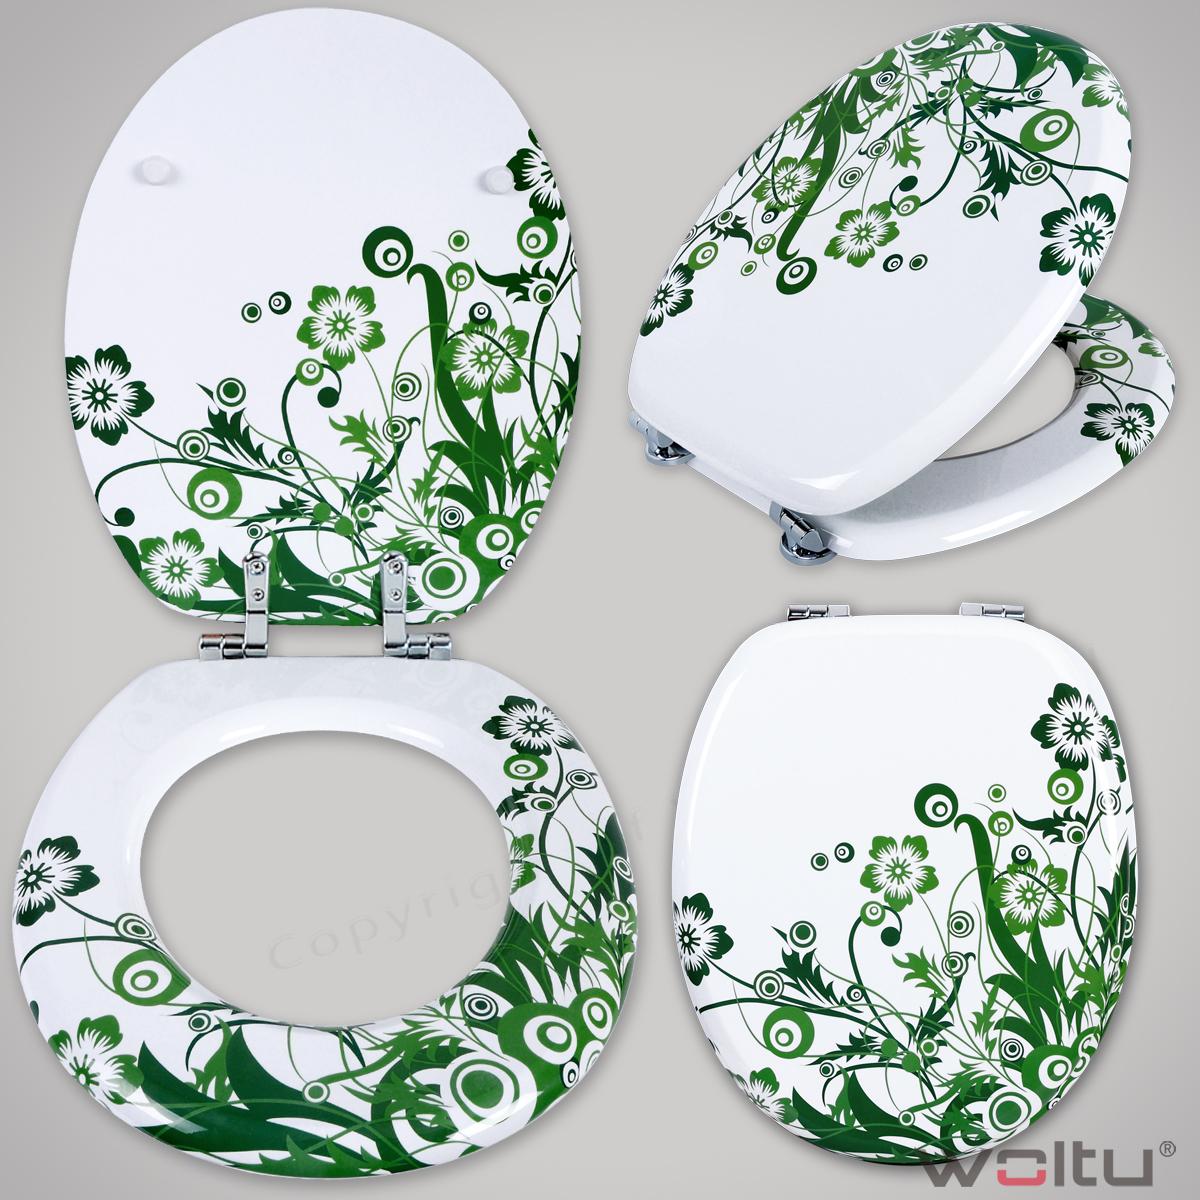 toilettensitz wc sitz klodeckel mdf brille klobrille. Black Bedroom Furniture Sets. Home Design Ideas